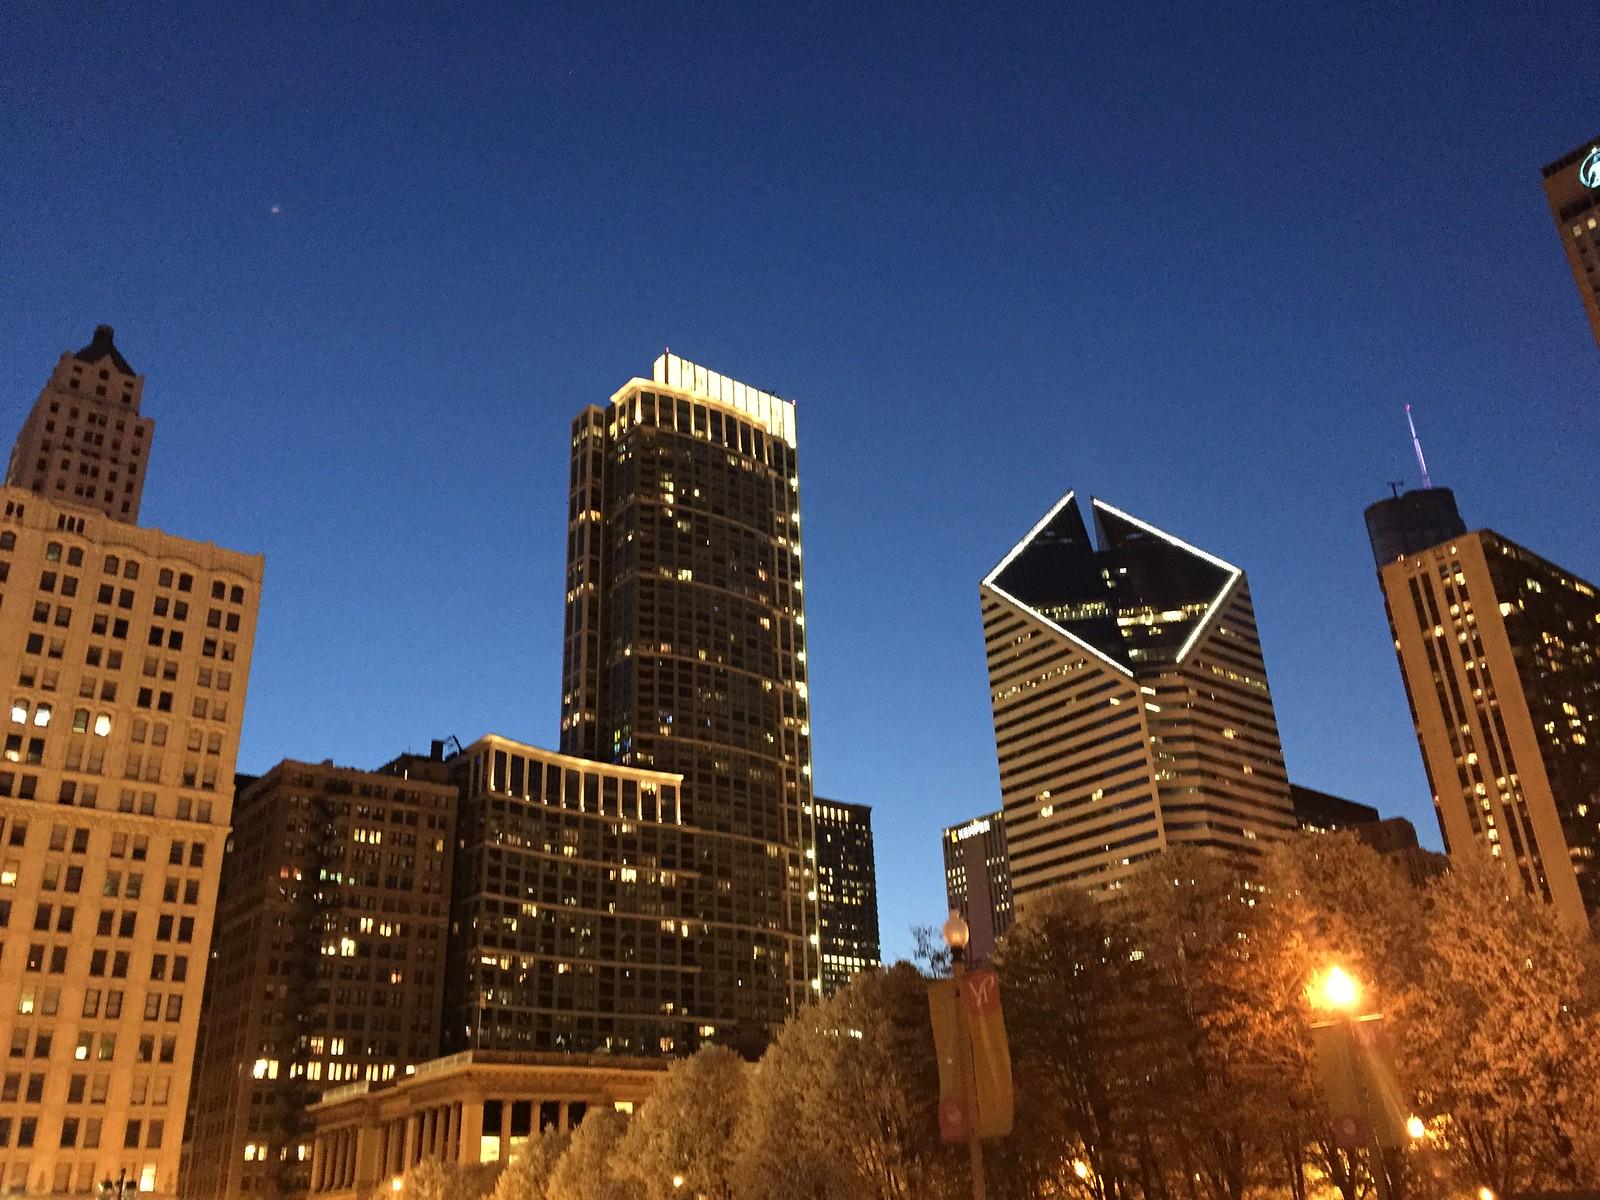 Chicago 23-04-2015 20-13-19